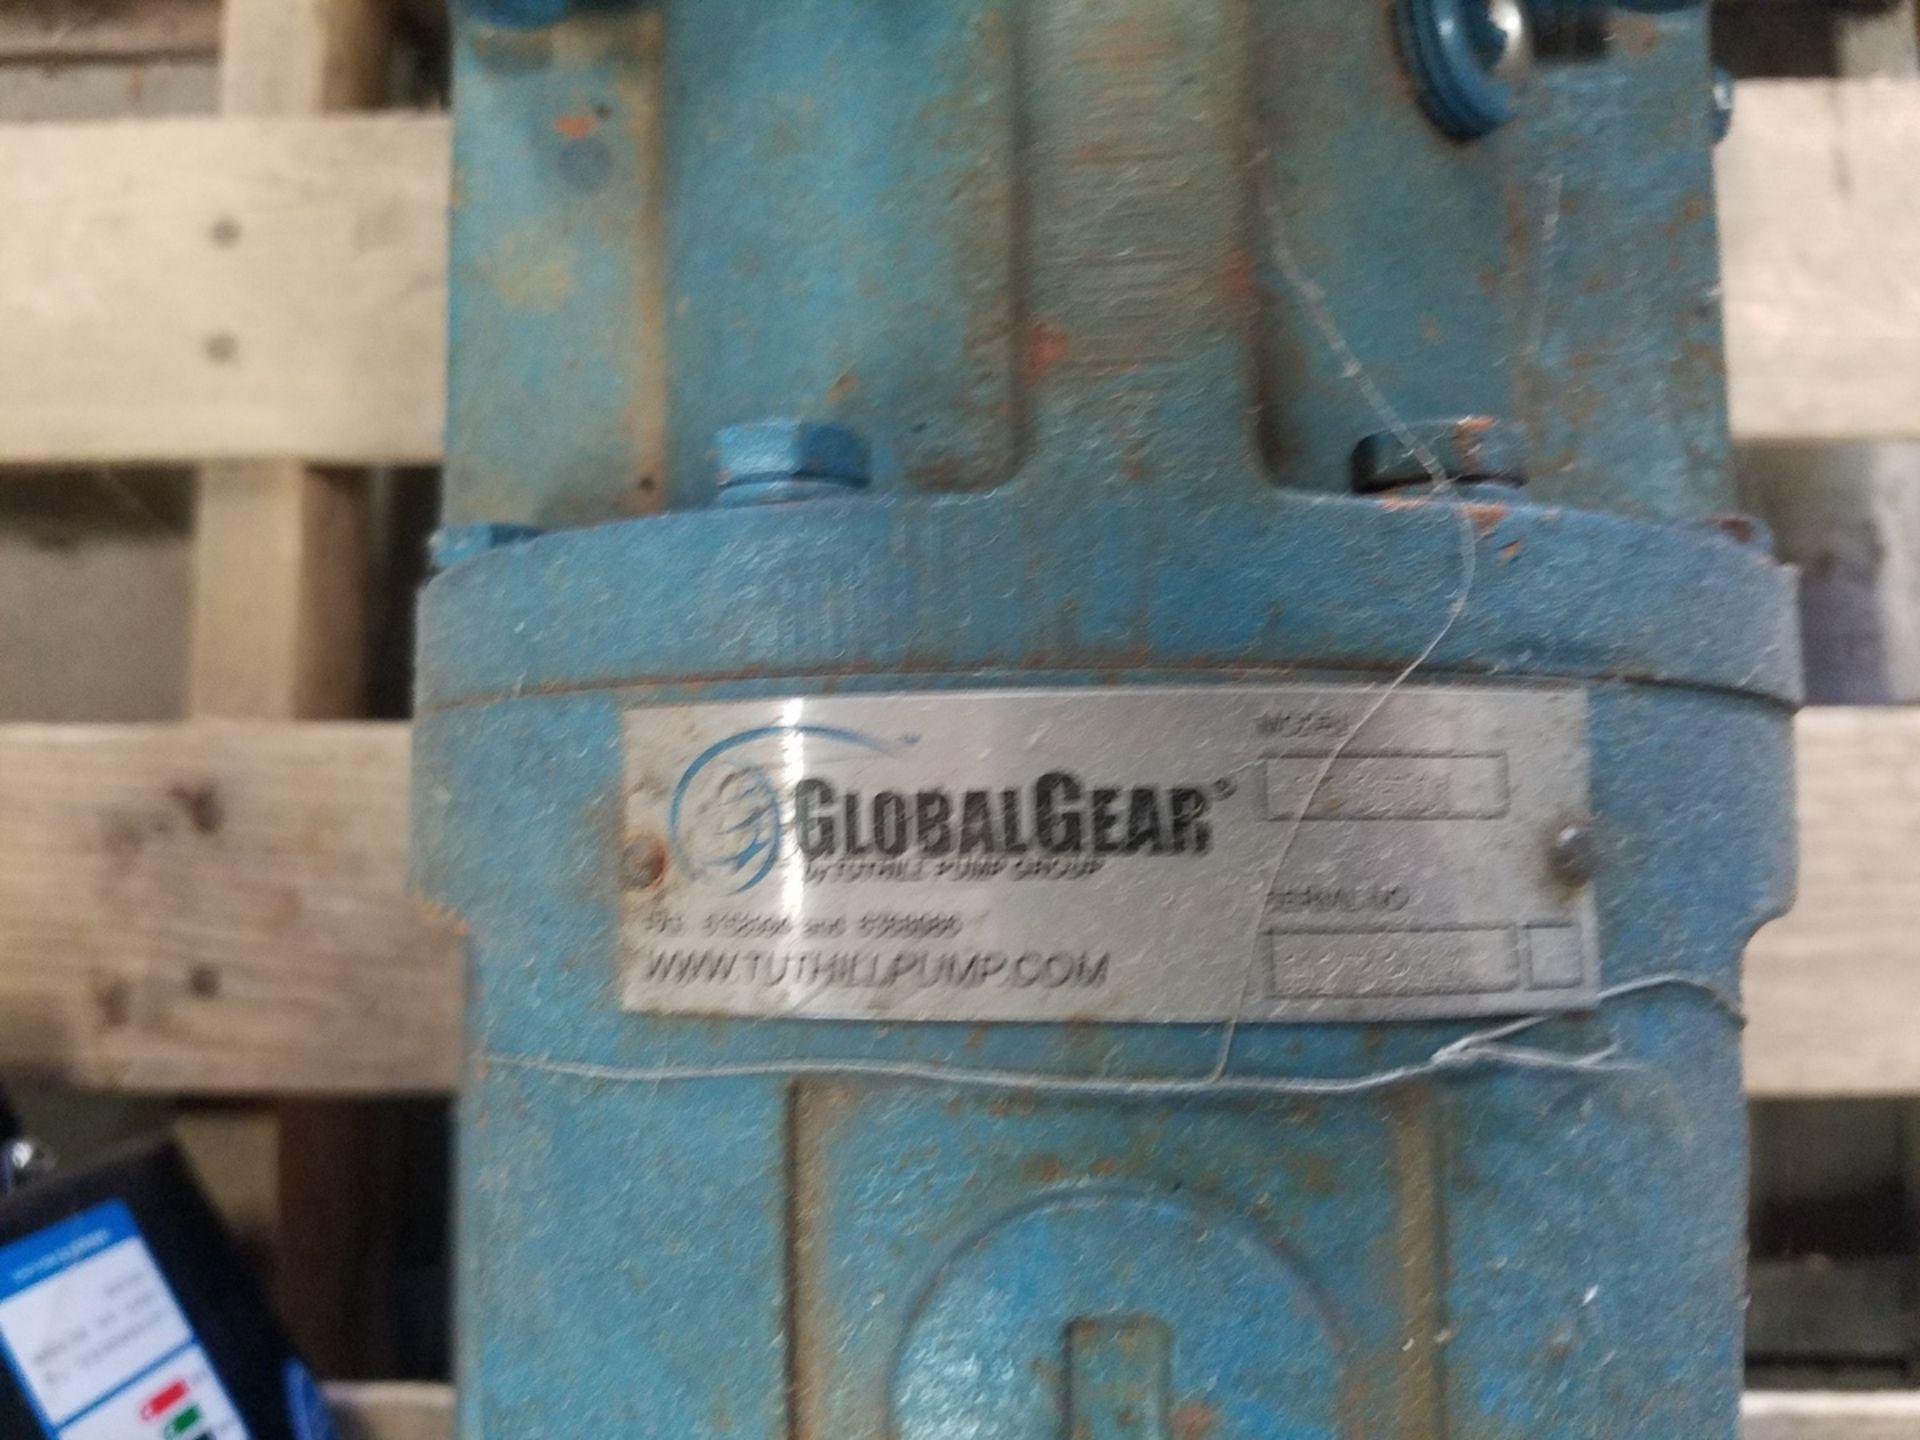 Global Gear Oil Transfer Pump, 5 HP | Rig Fee: $50 - Image 2 of 3